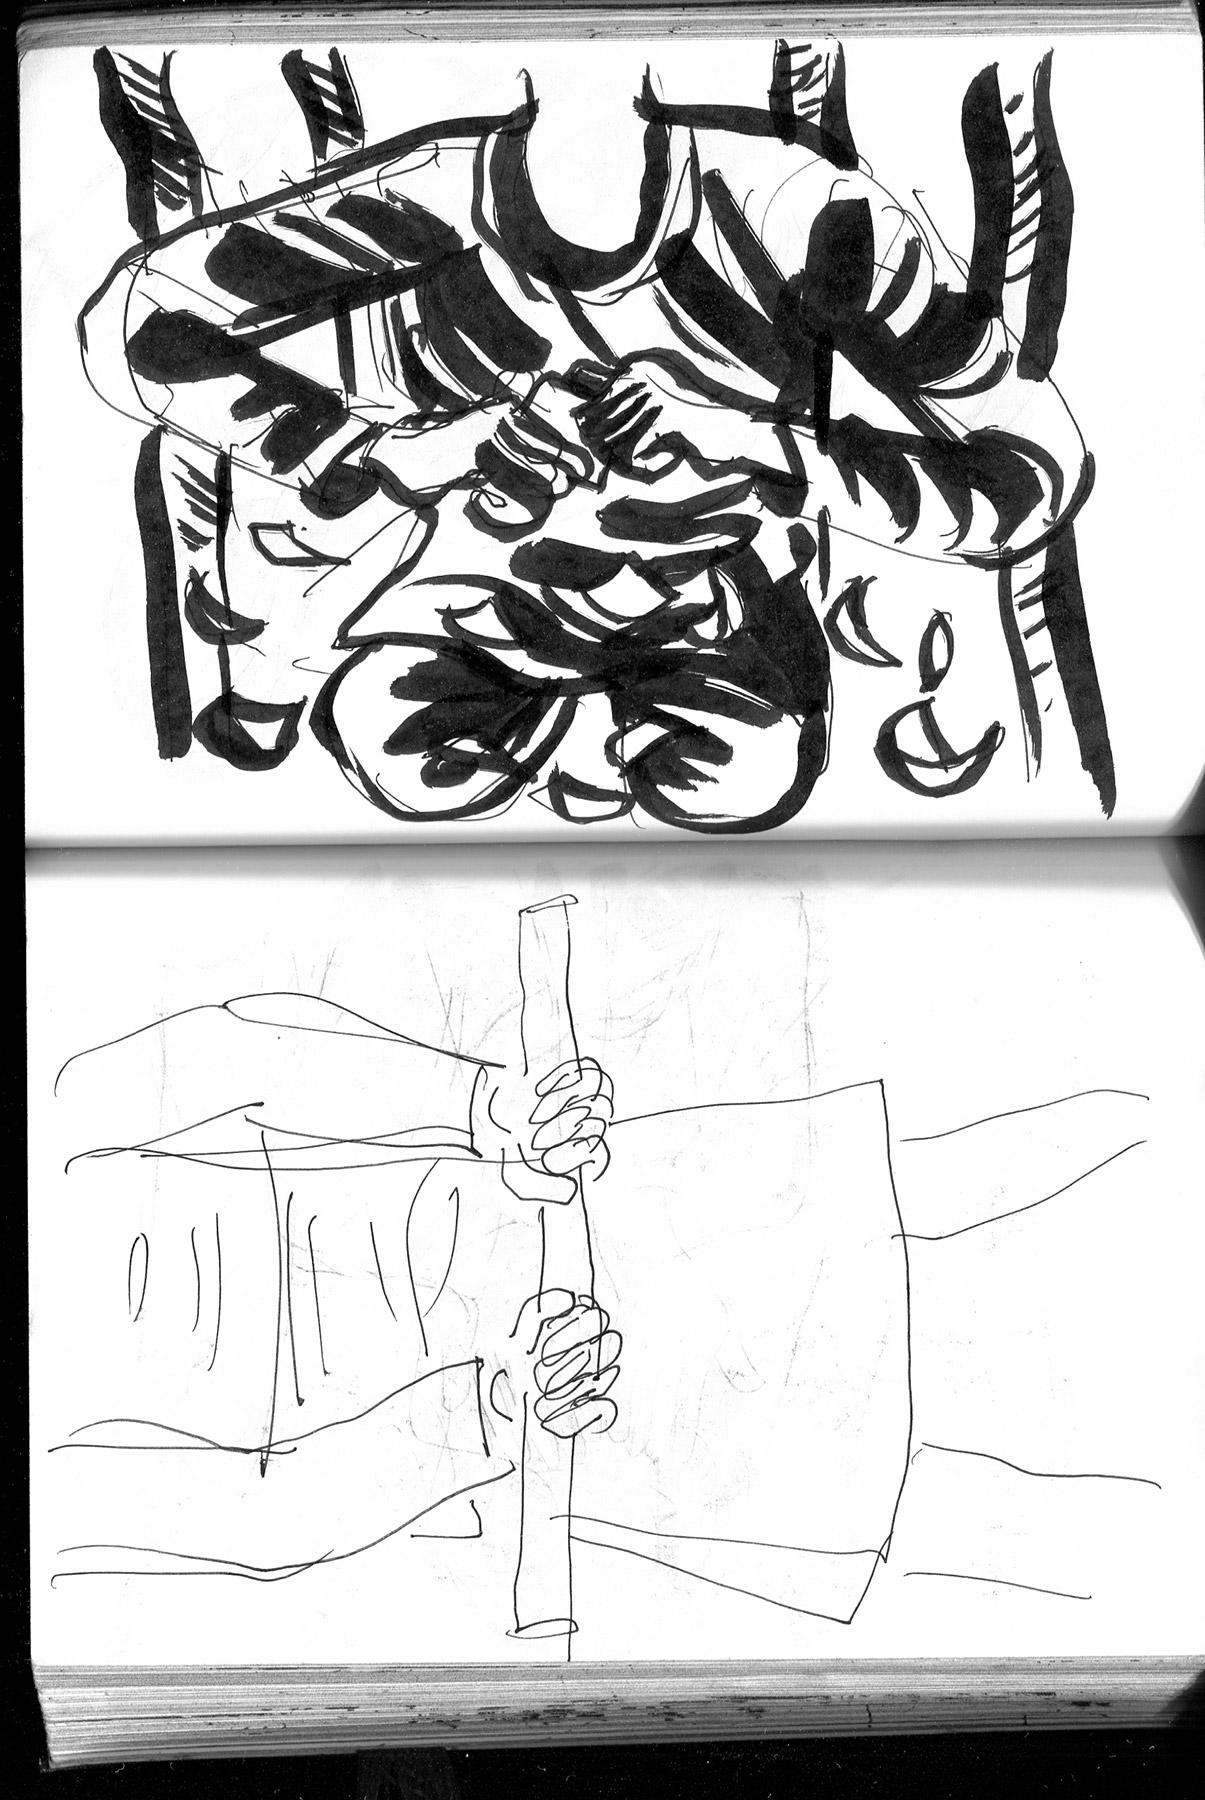 davidm_sketches_2014_08-064.jpg